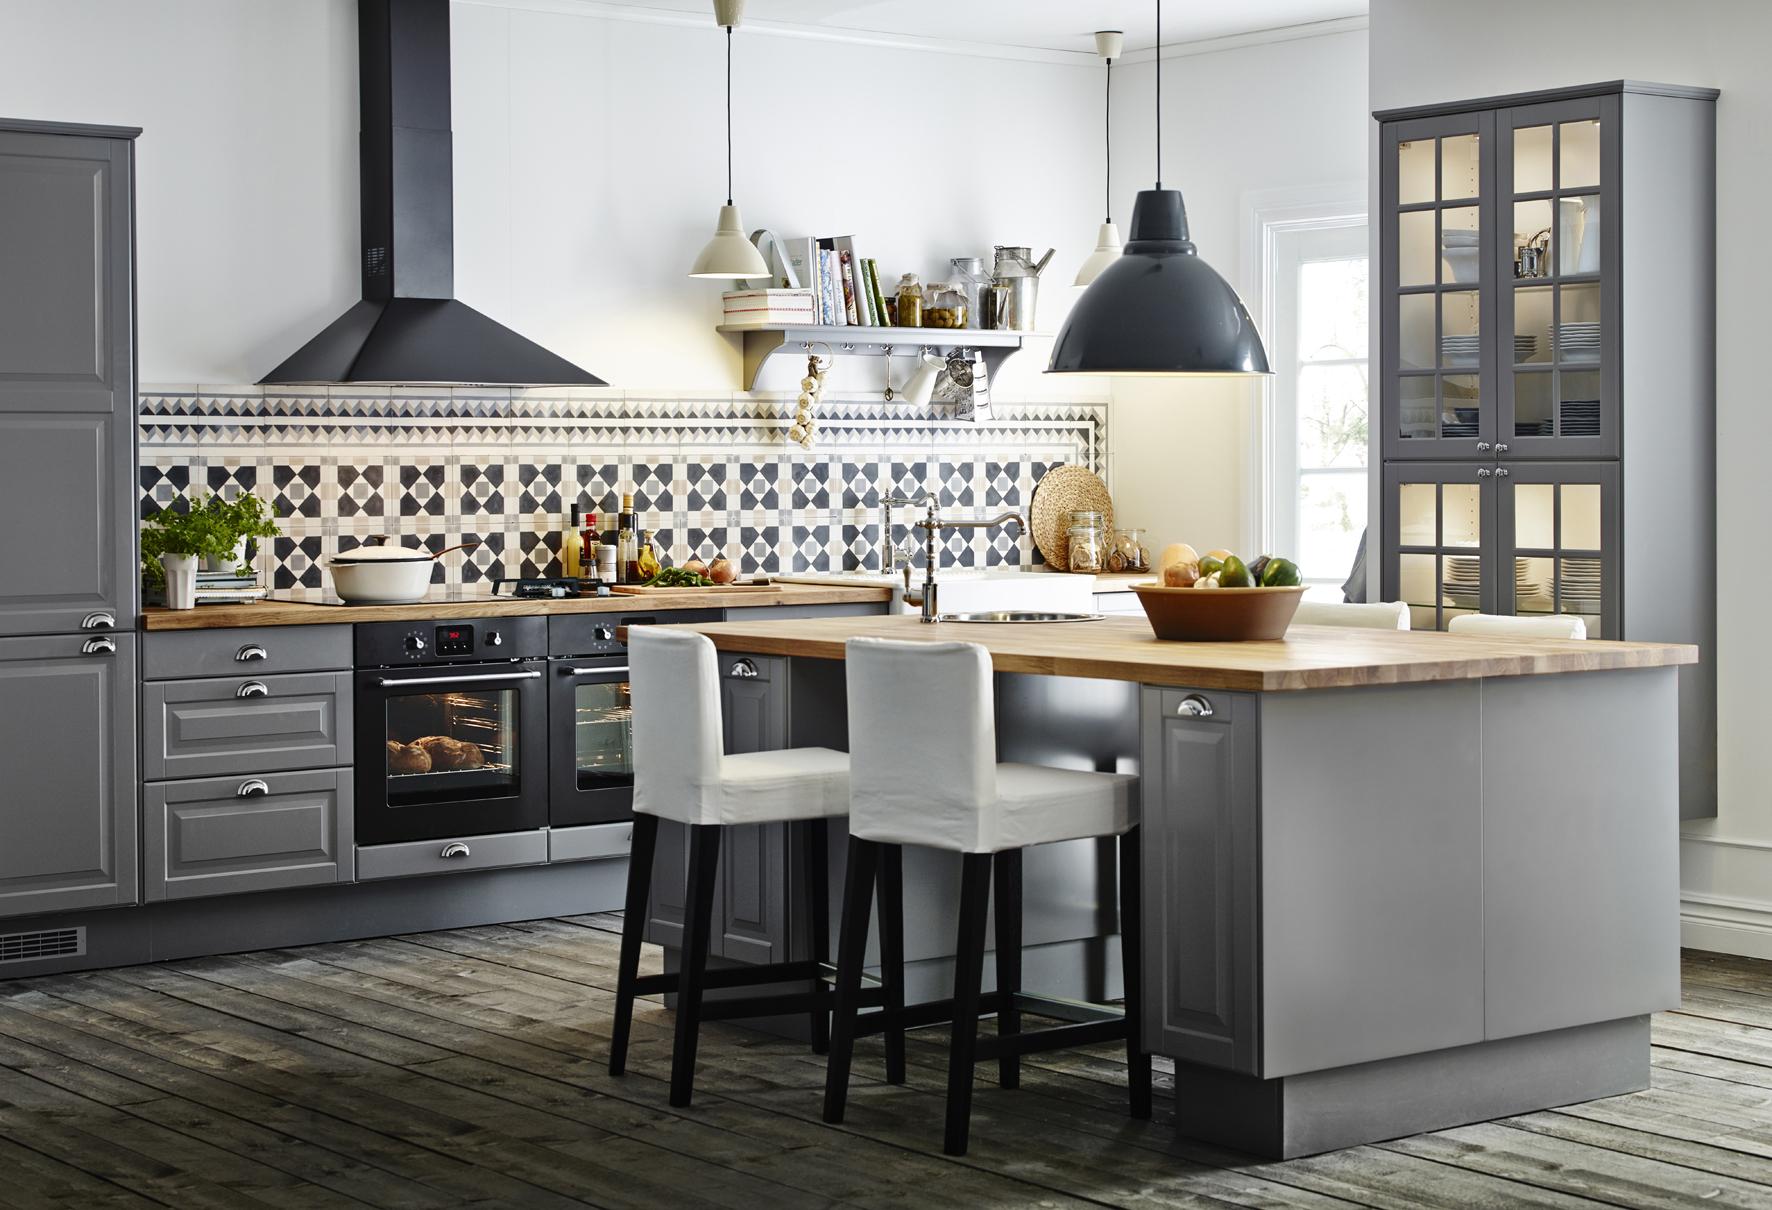 Patroontegels in keuken